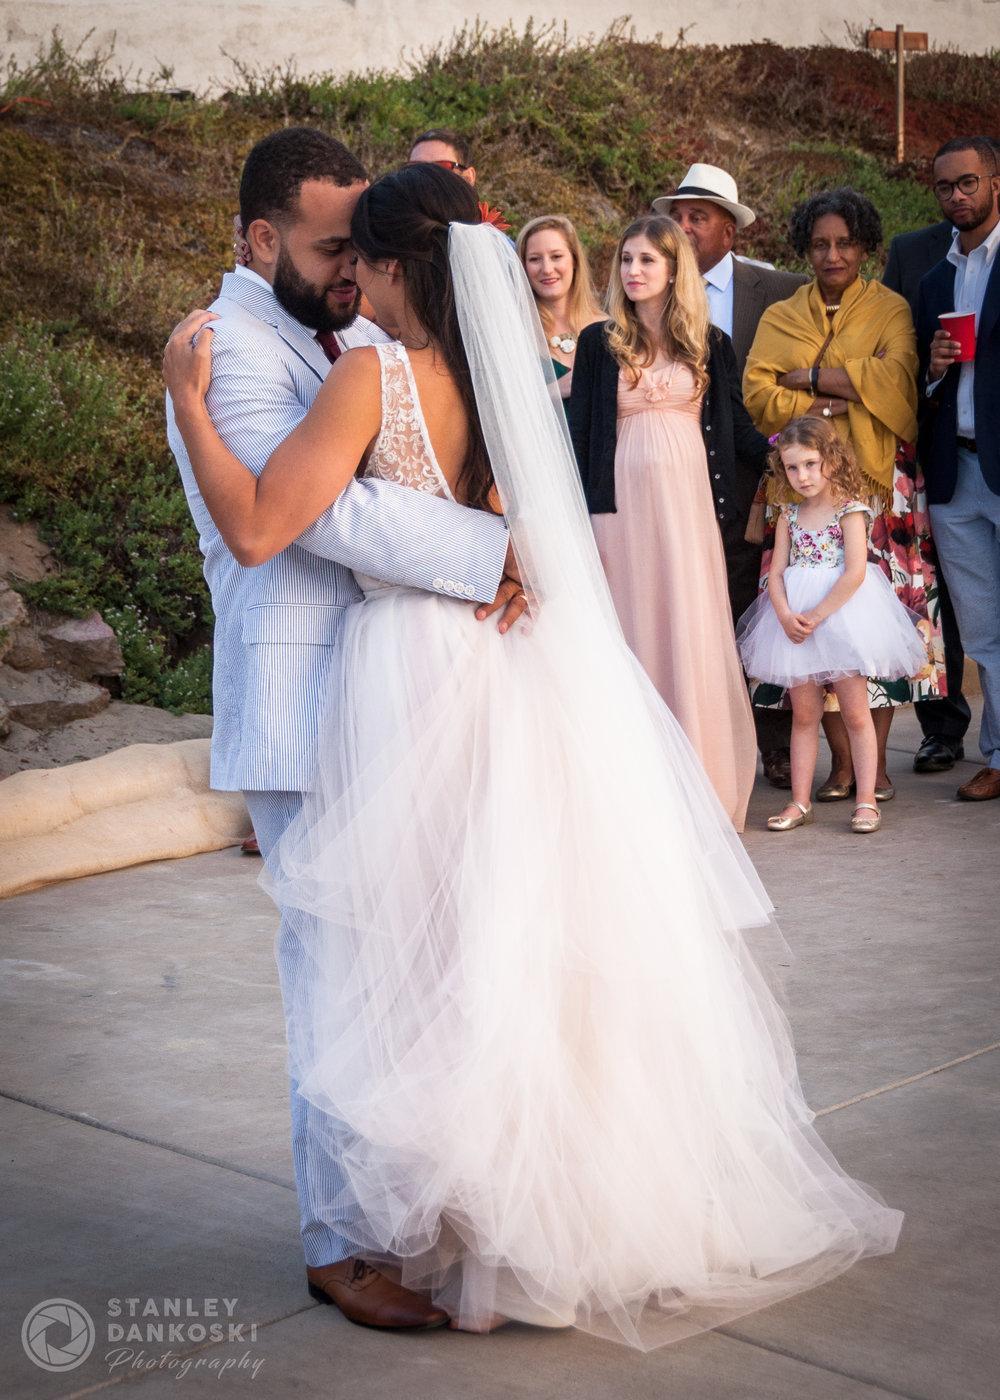 noah-toni-wedding-by-stanley-dankoski-0395.jpg